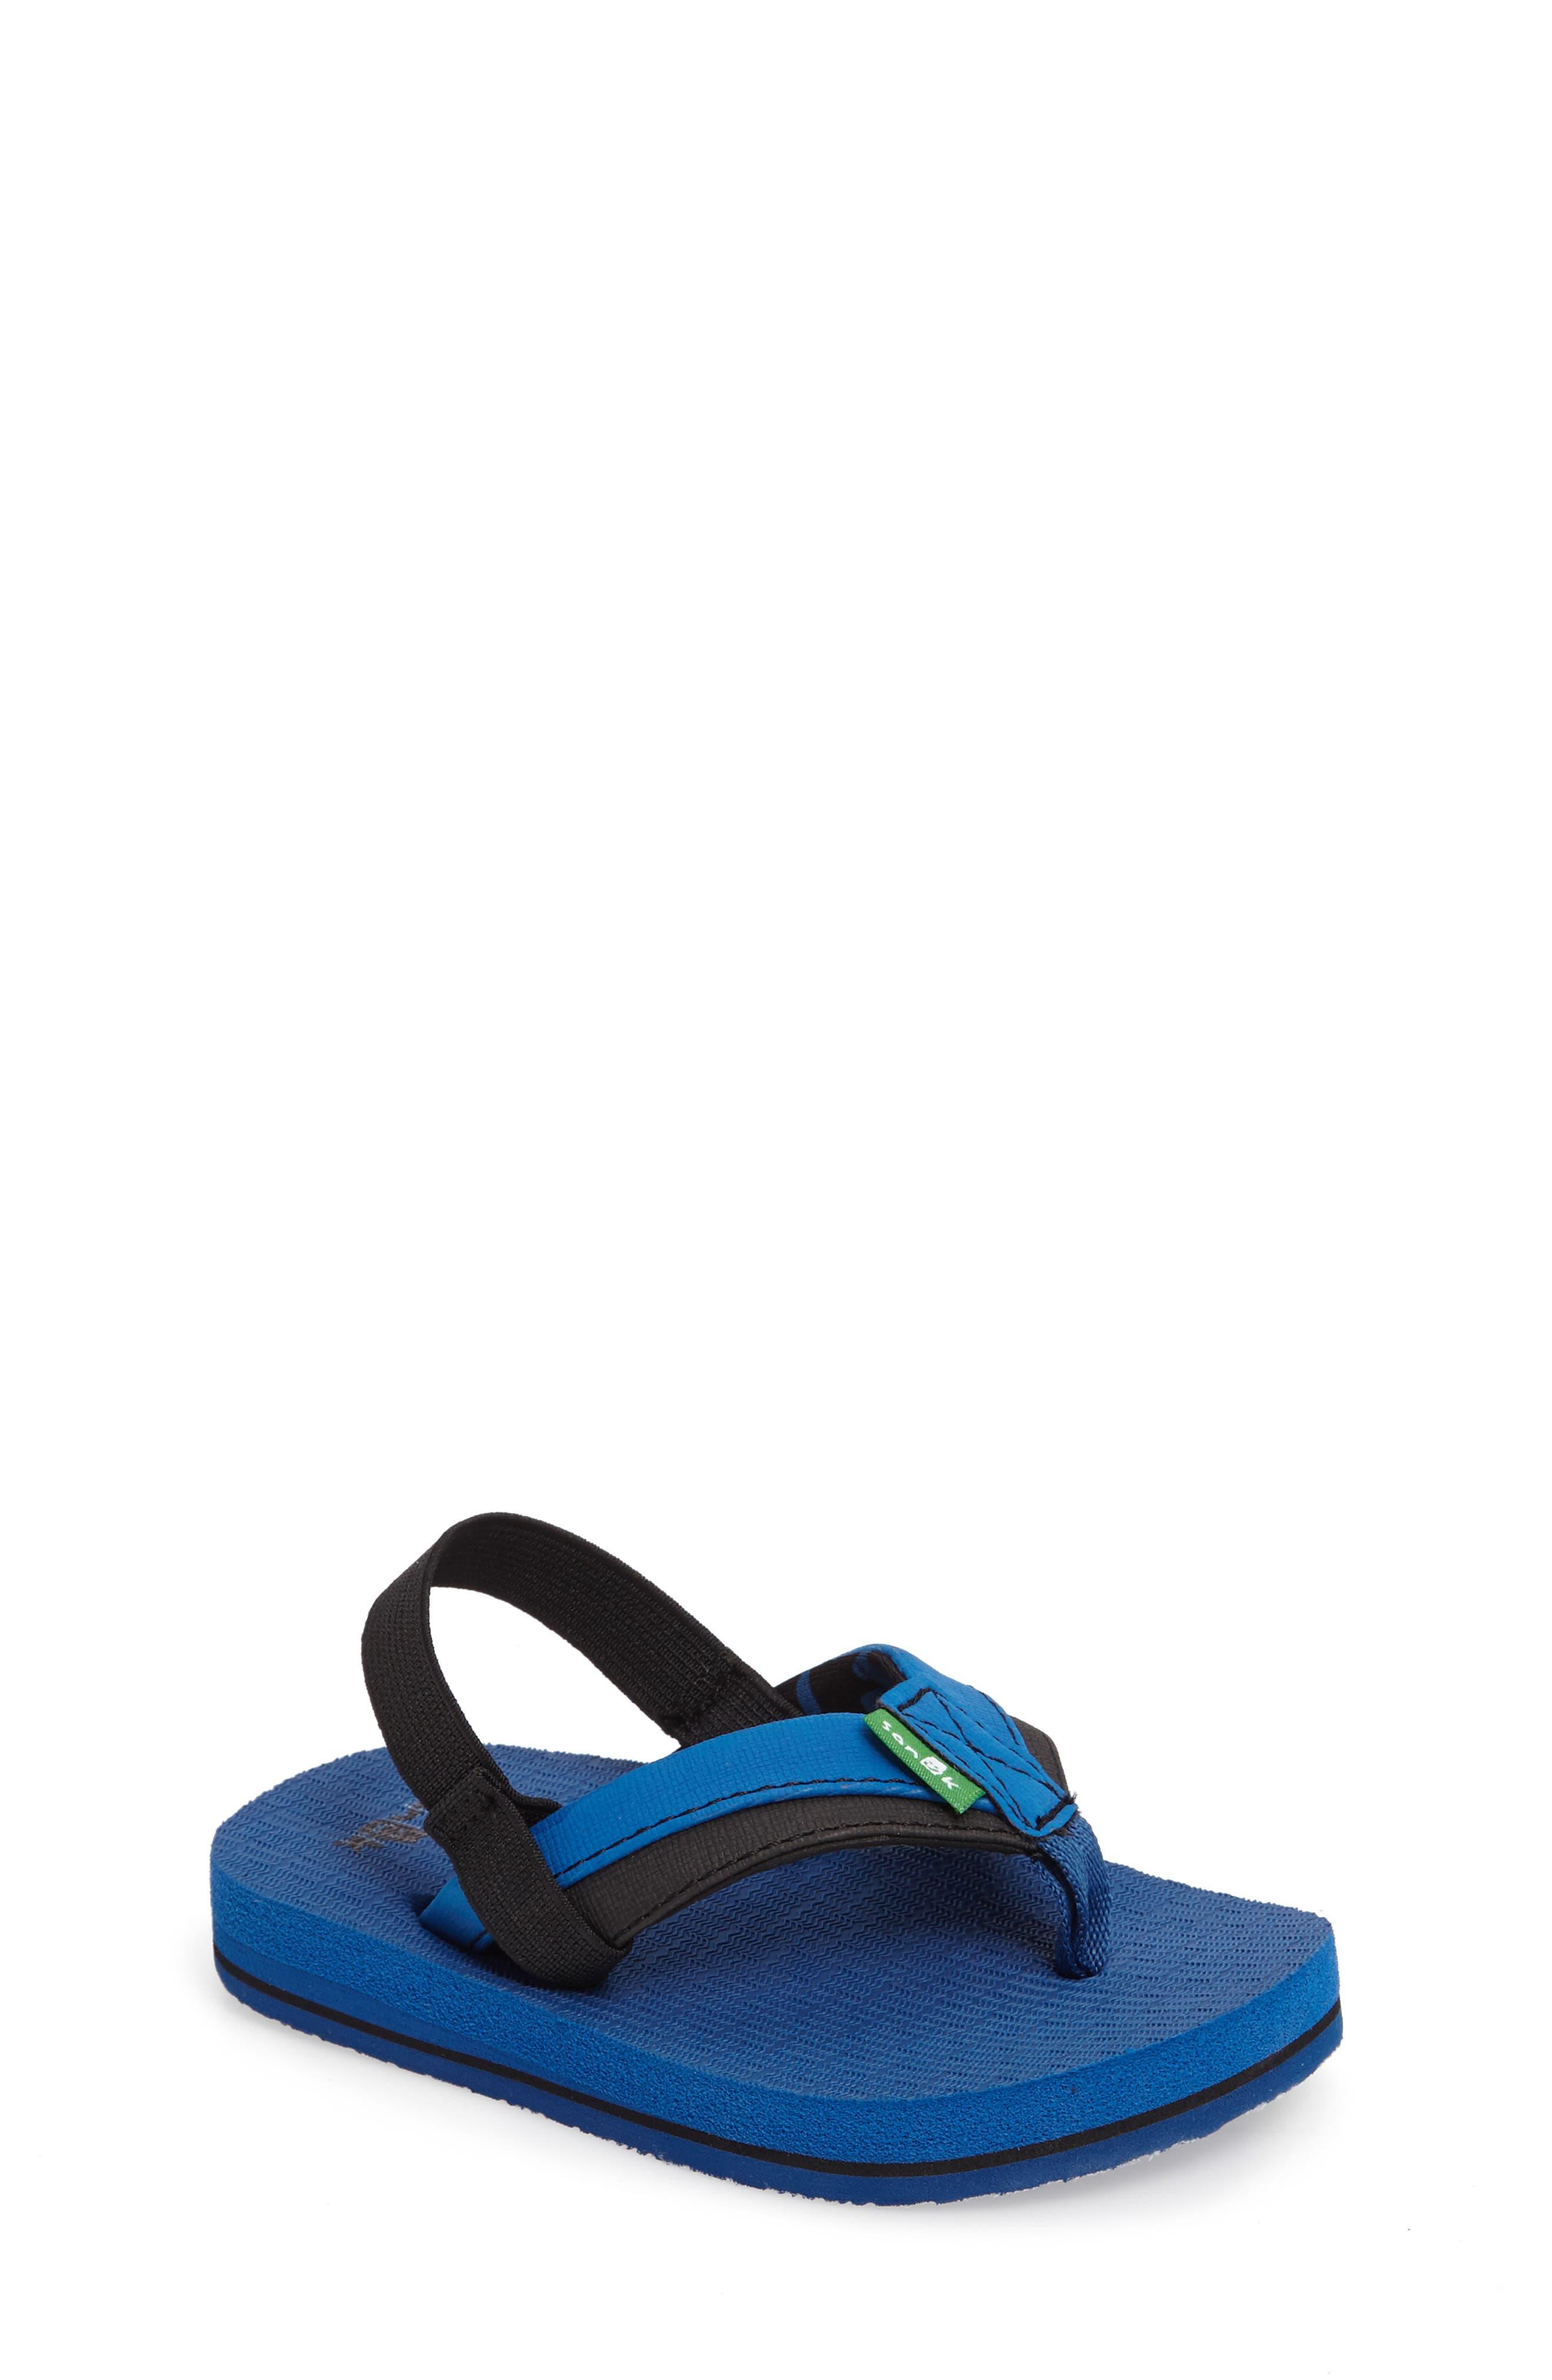 'Rootbeer Cozy' Lightweight Flip Flop Sandal,                             Main thumbnail 2, color,